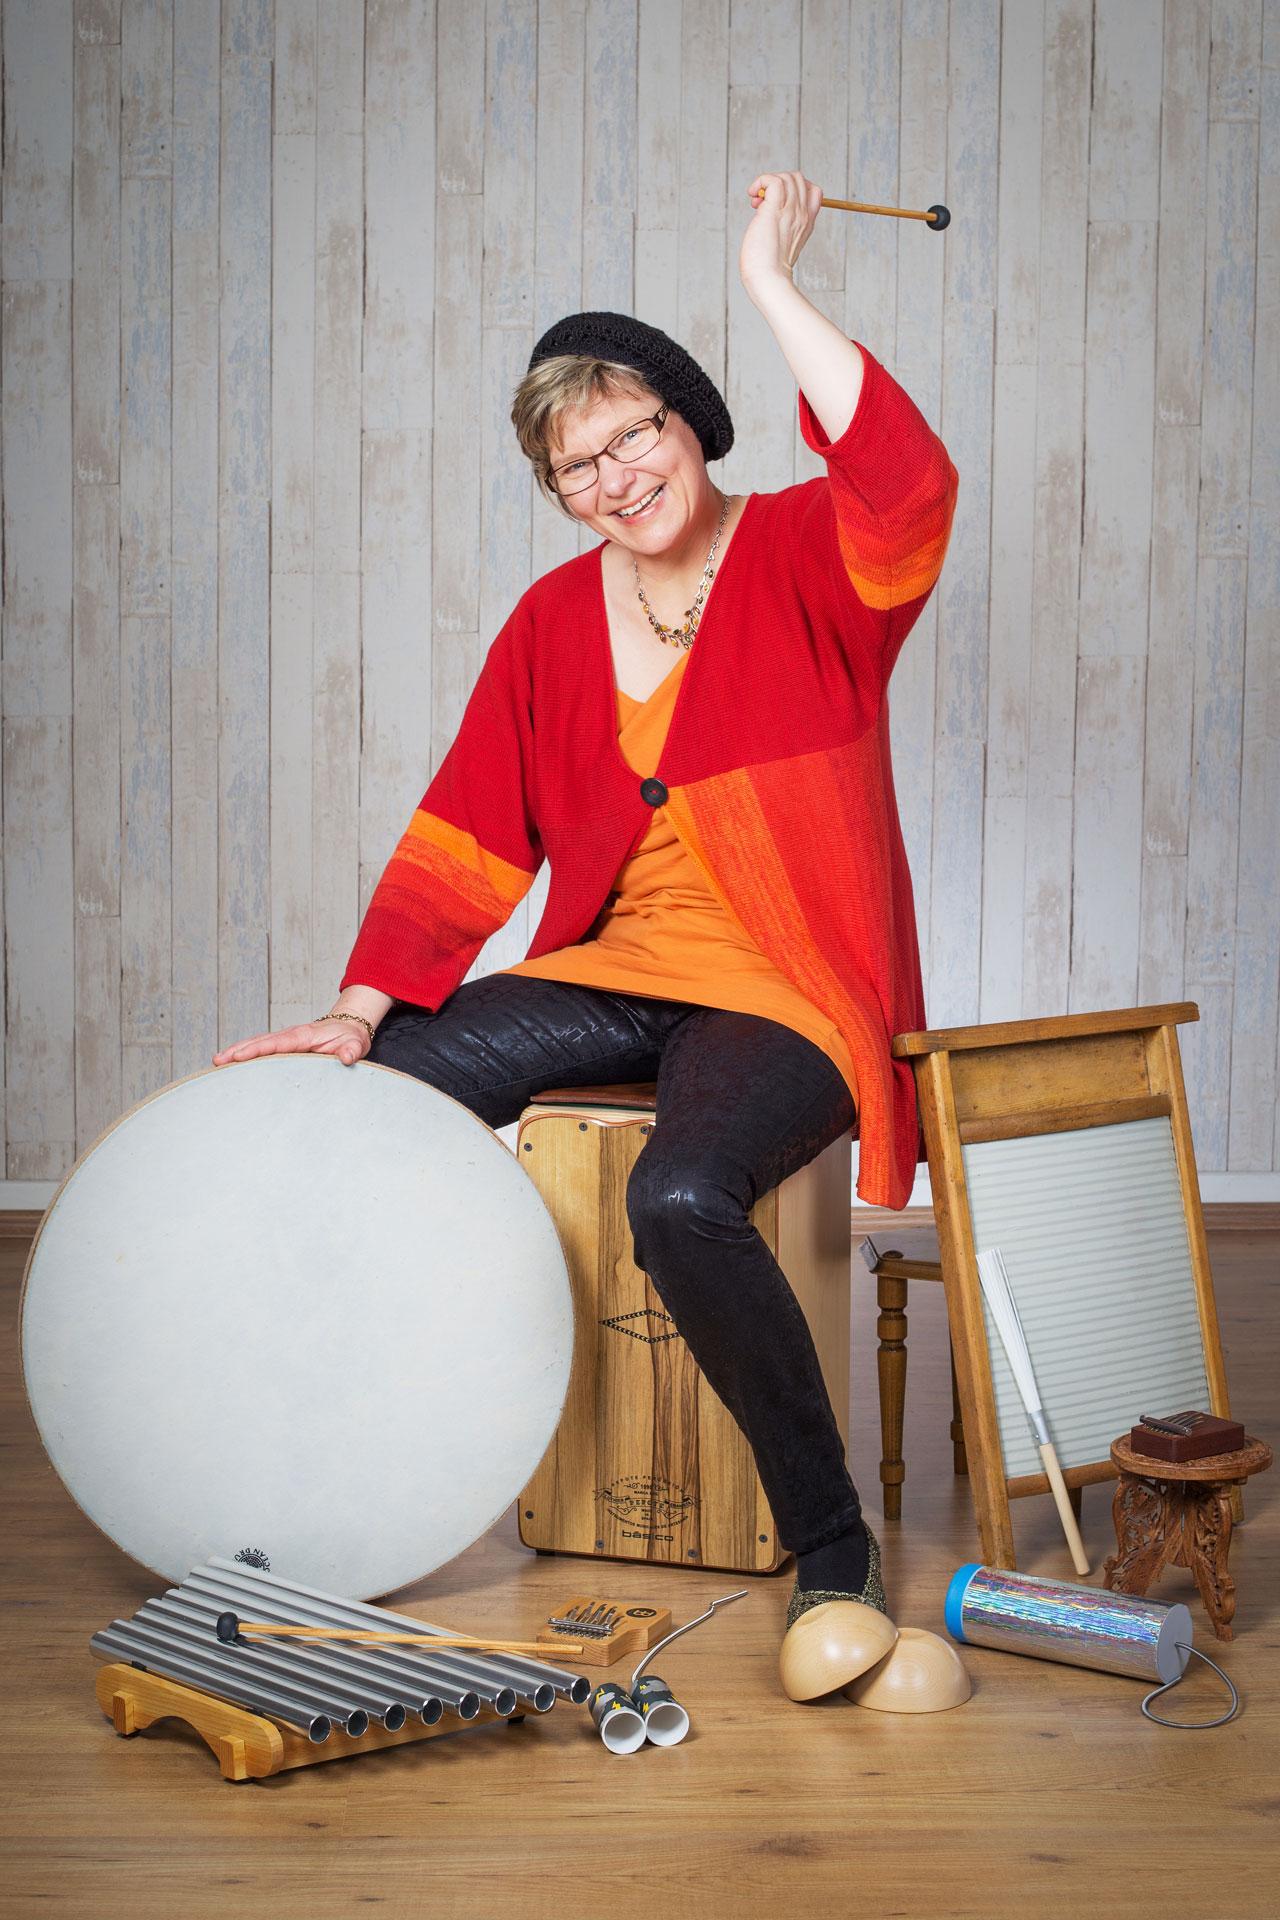 Birgit Fritz by Monika Baumann